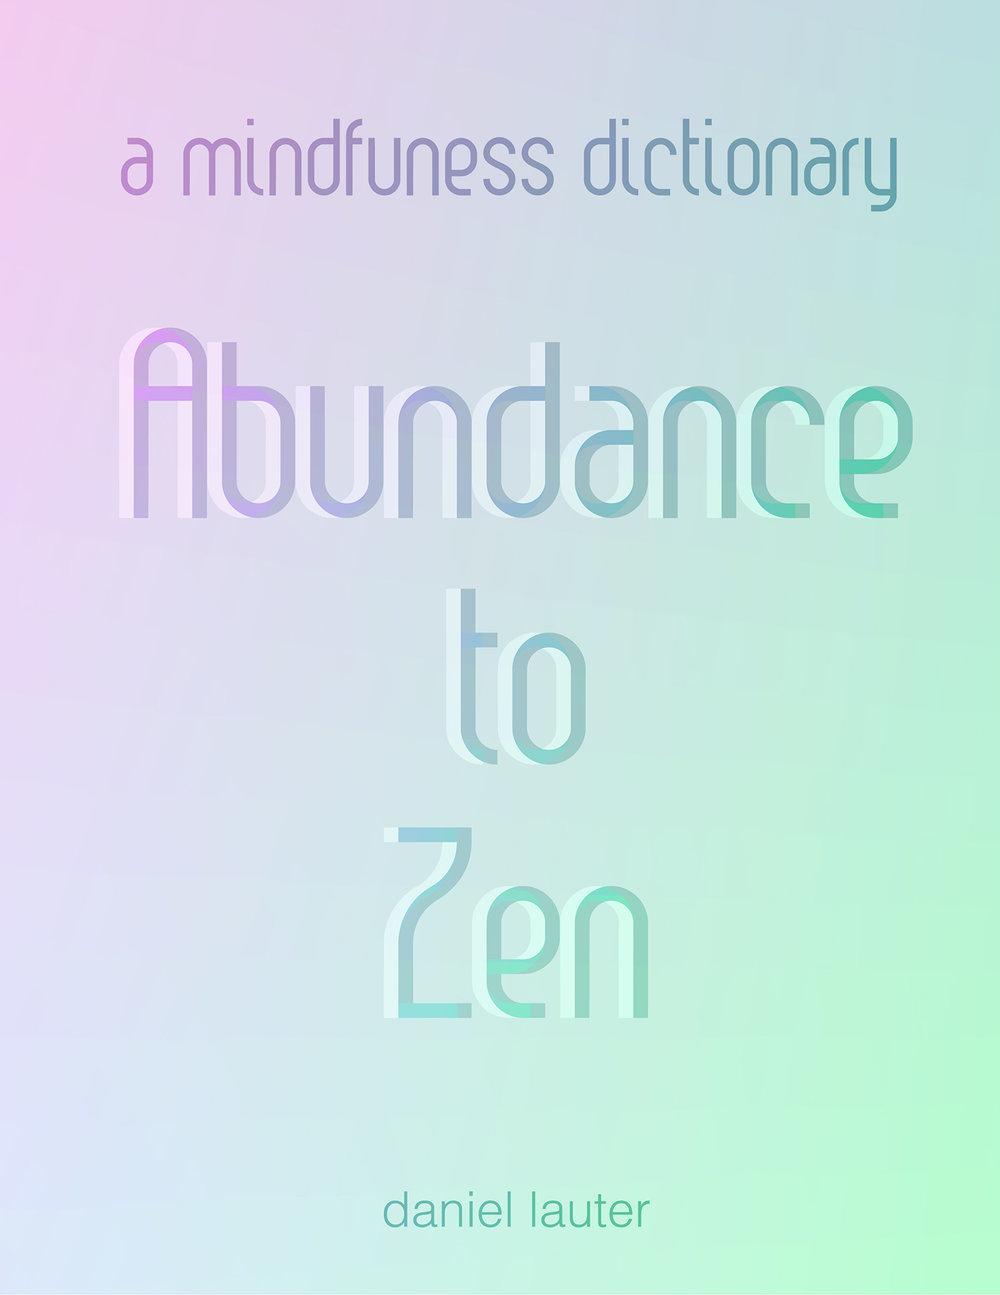 A Mindfulness Dictionary